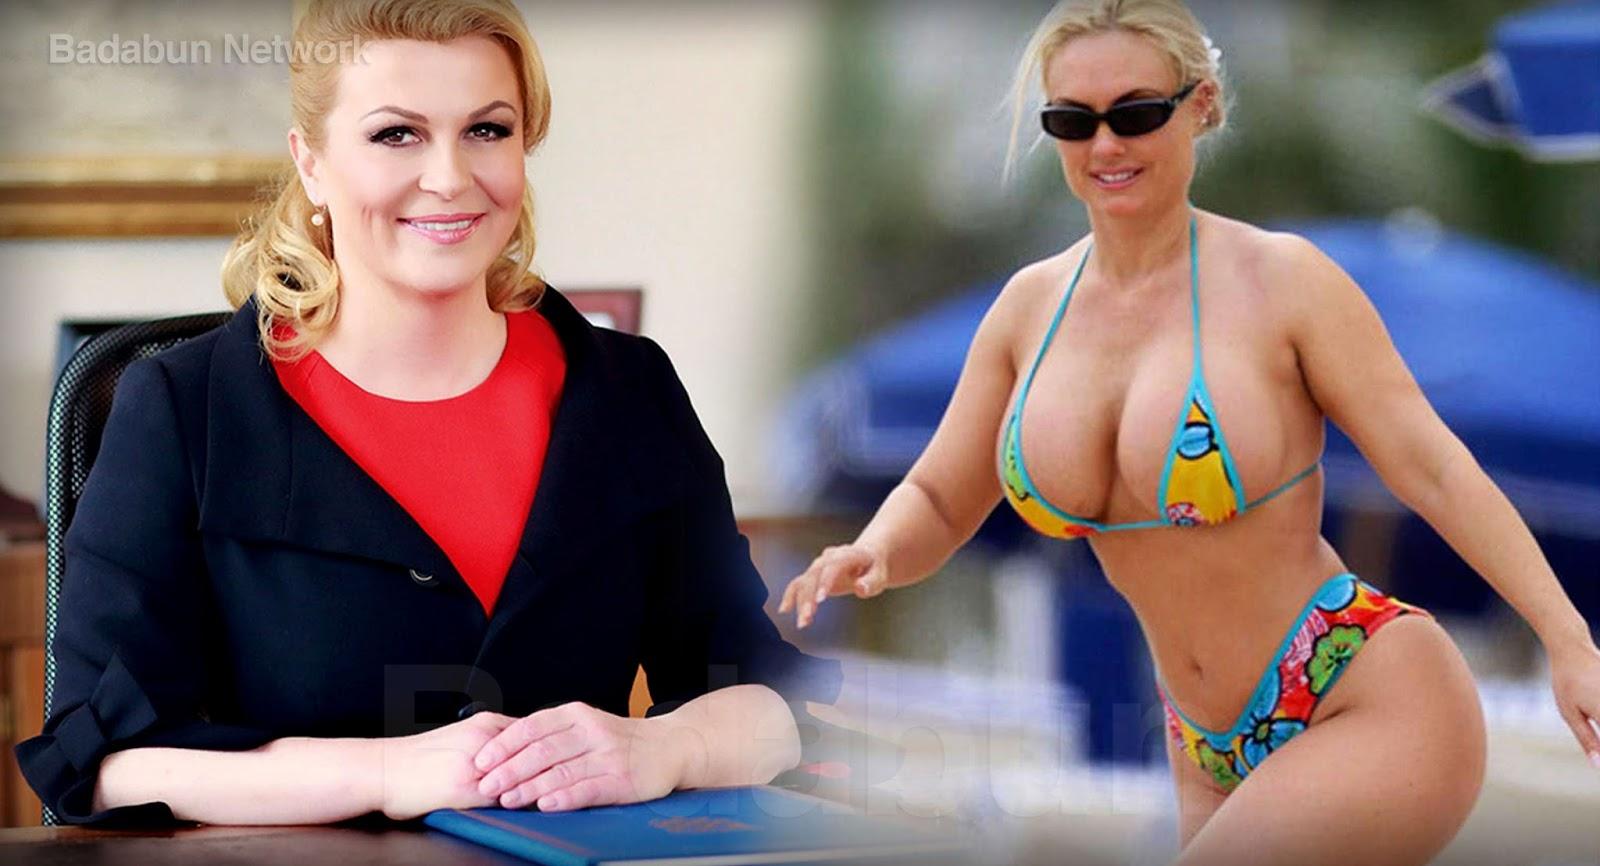 Presidente De Croacia En Bikini - takvim kalender HD